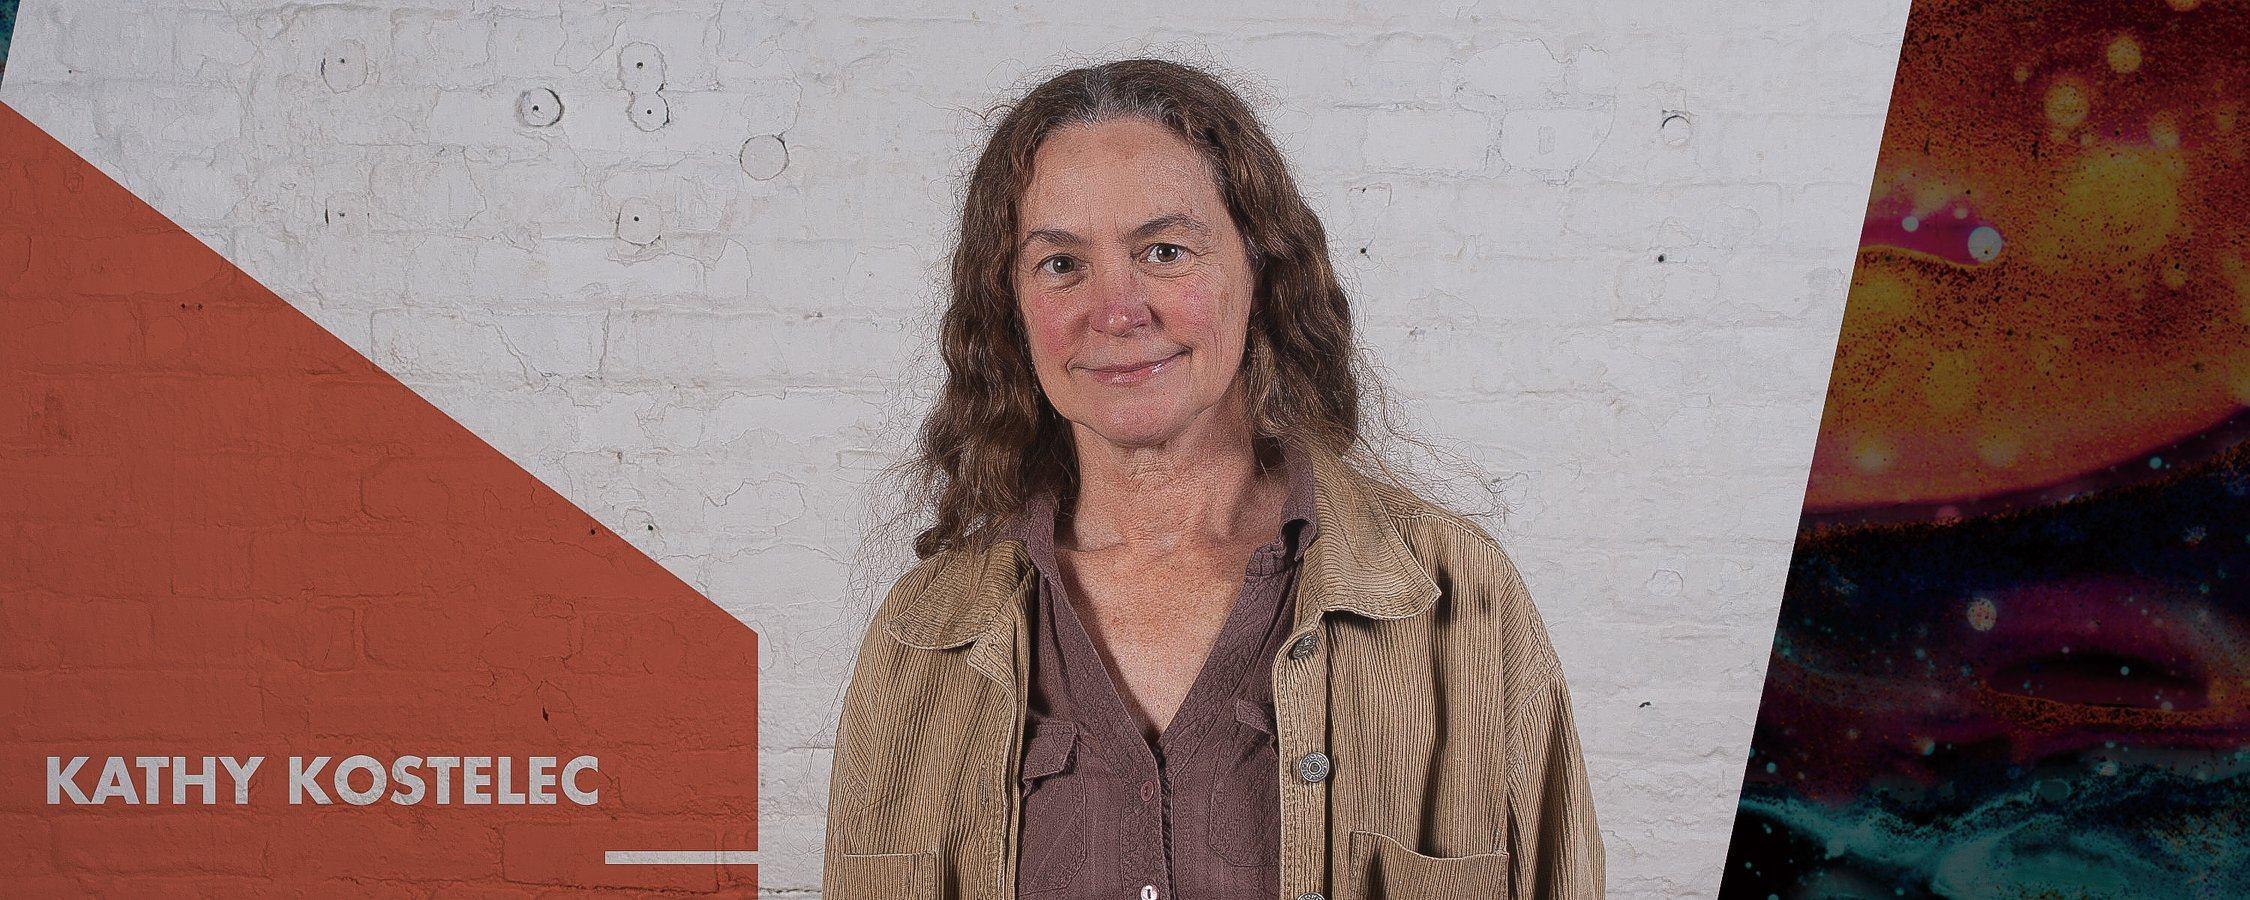 Kathy Kostelec